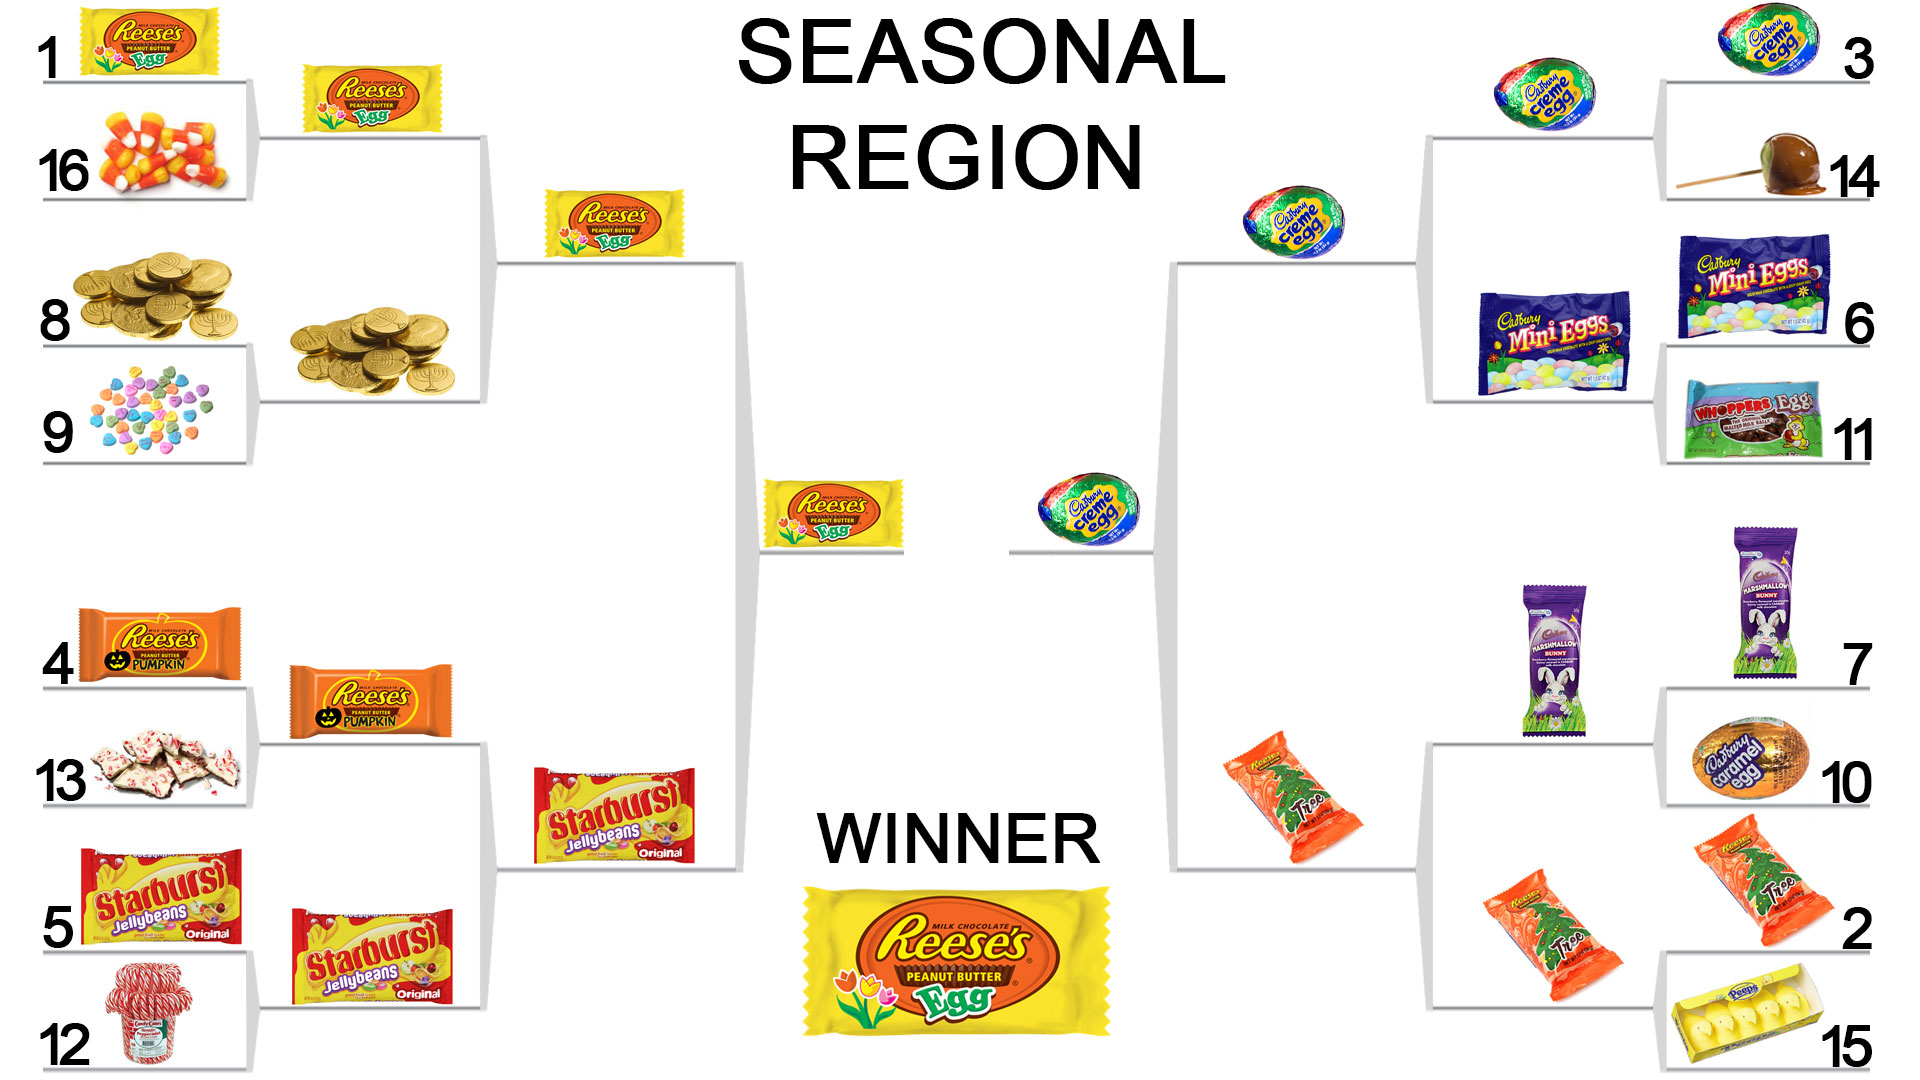 Sporting News Candy Bracket Seasonal Candy Region Ncaa Basketball